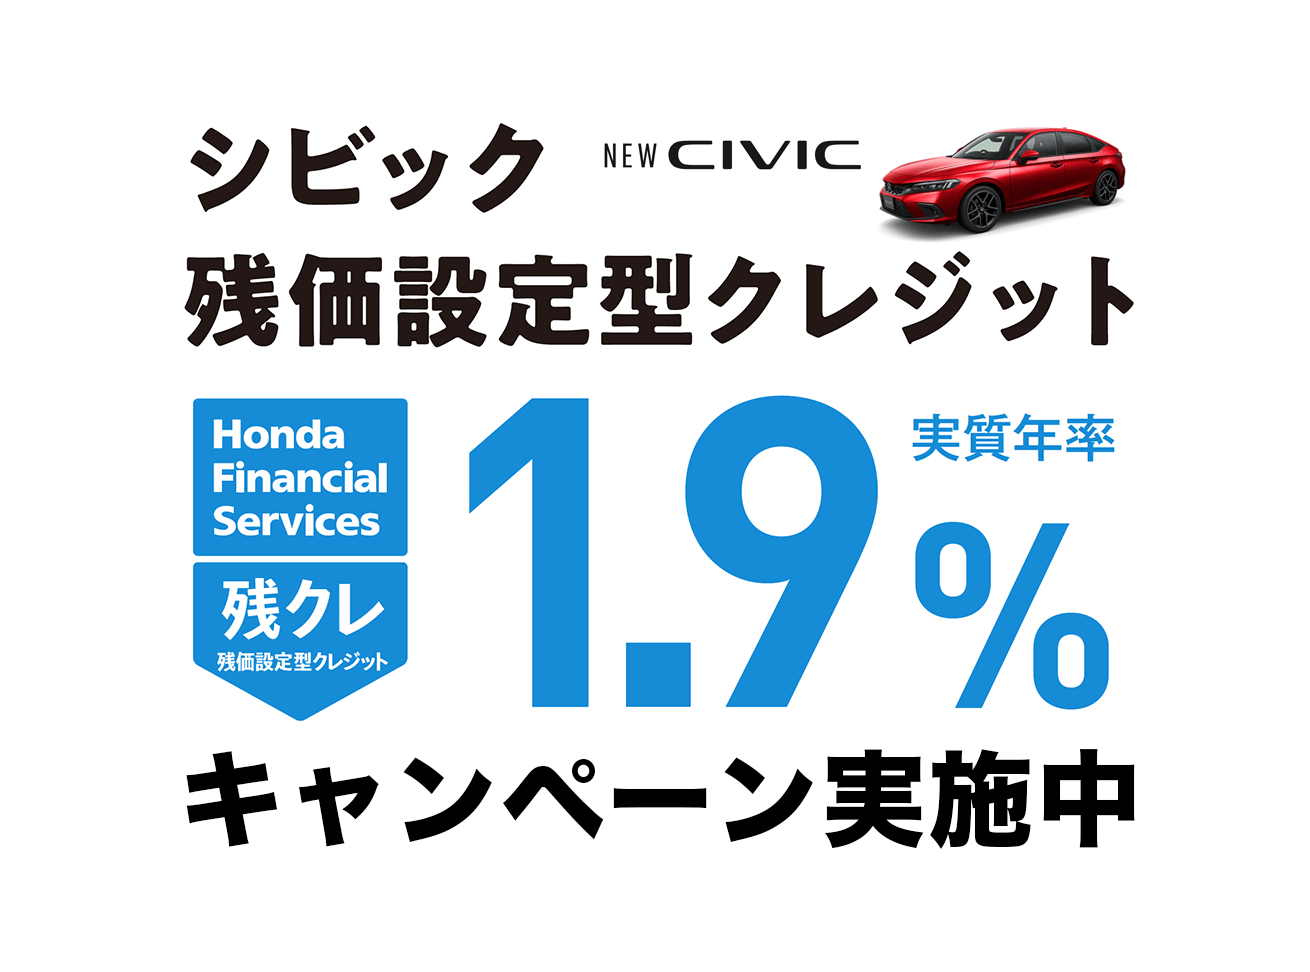 http://シビック%20残価設定型クレジット%201.9%キャンペーン実施中